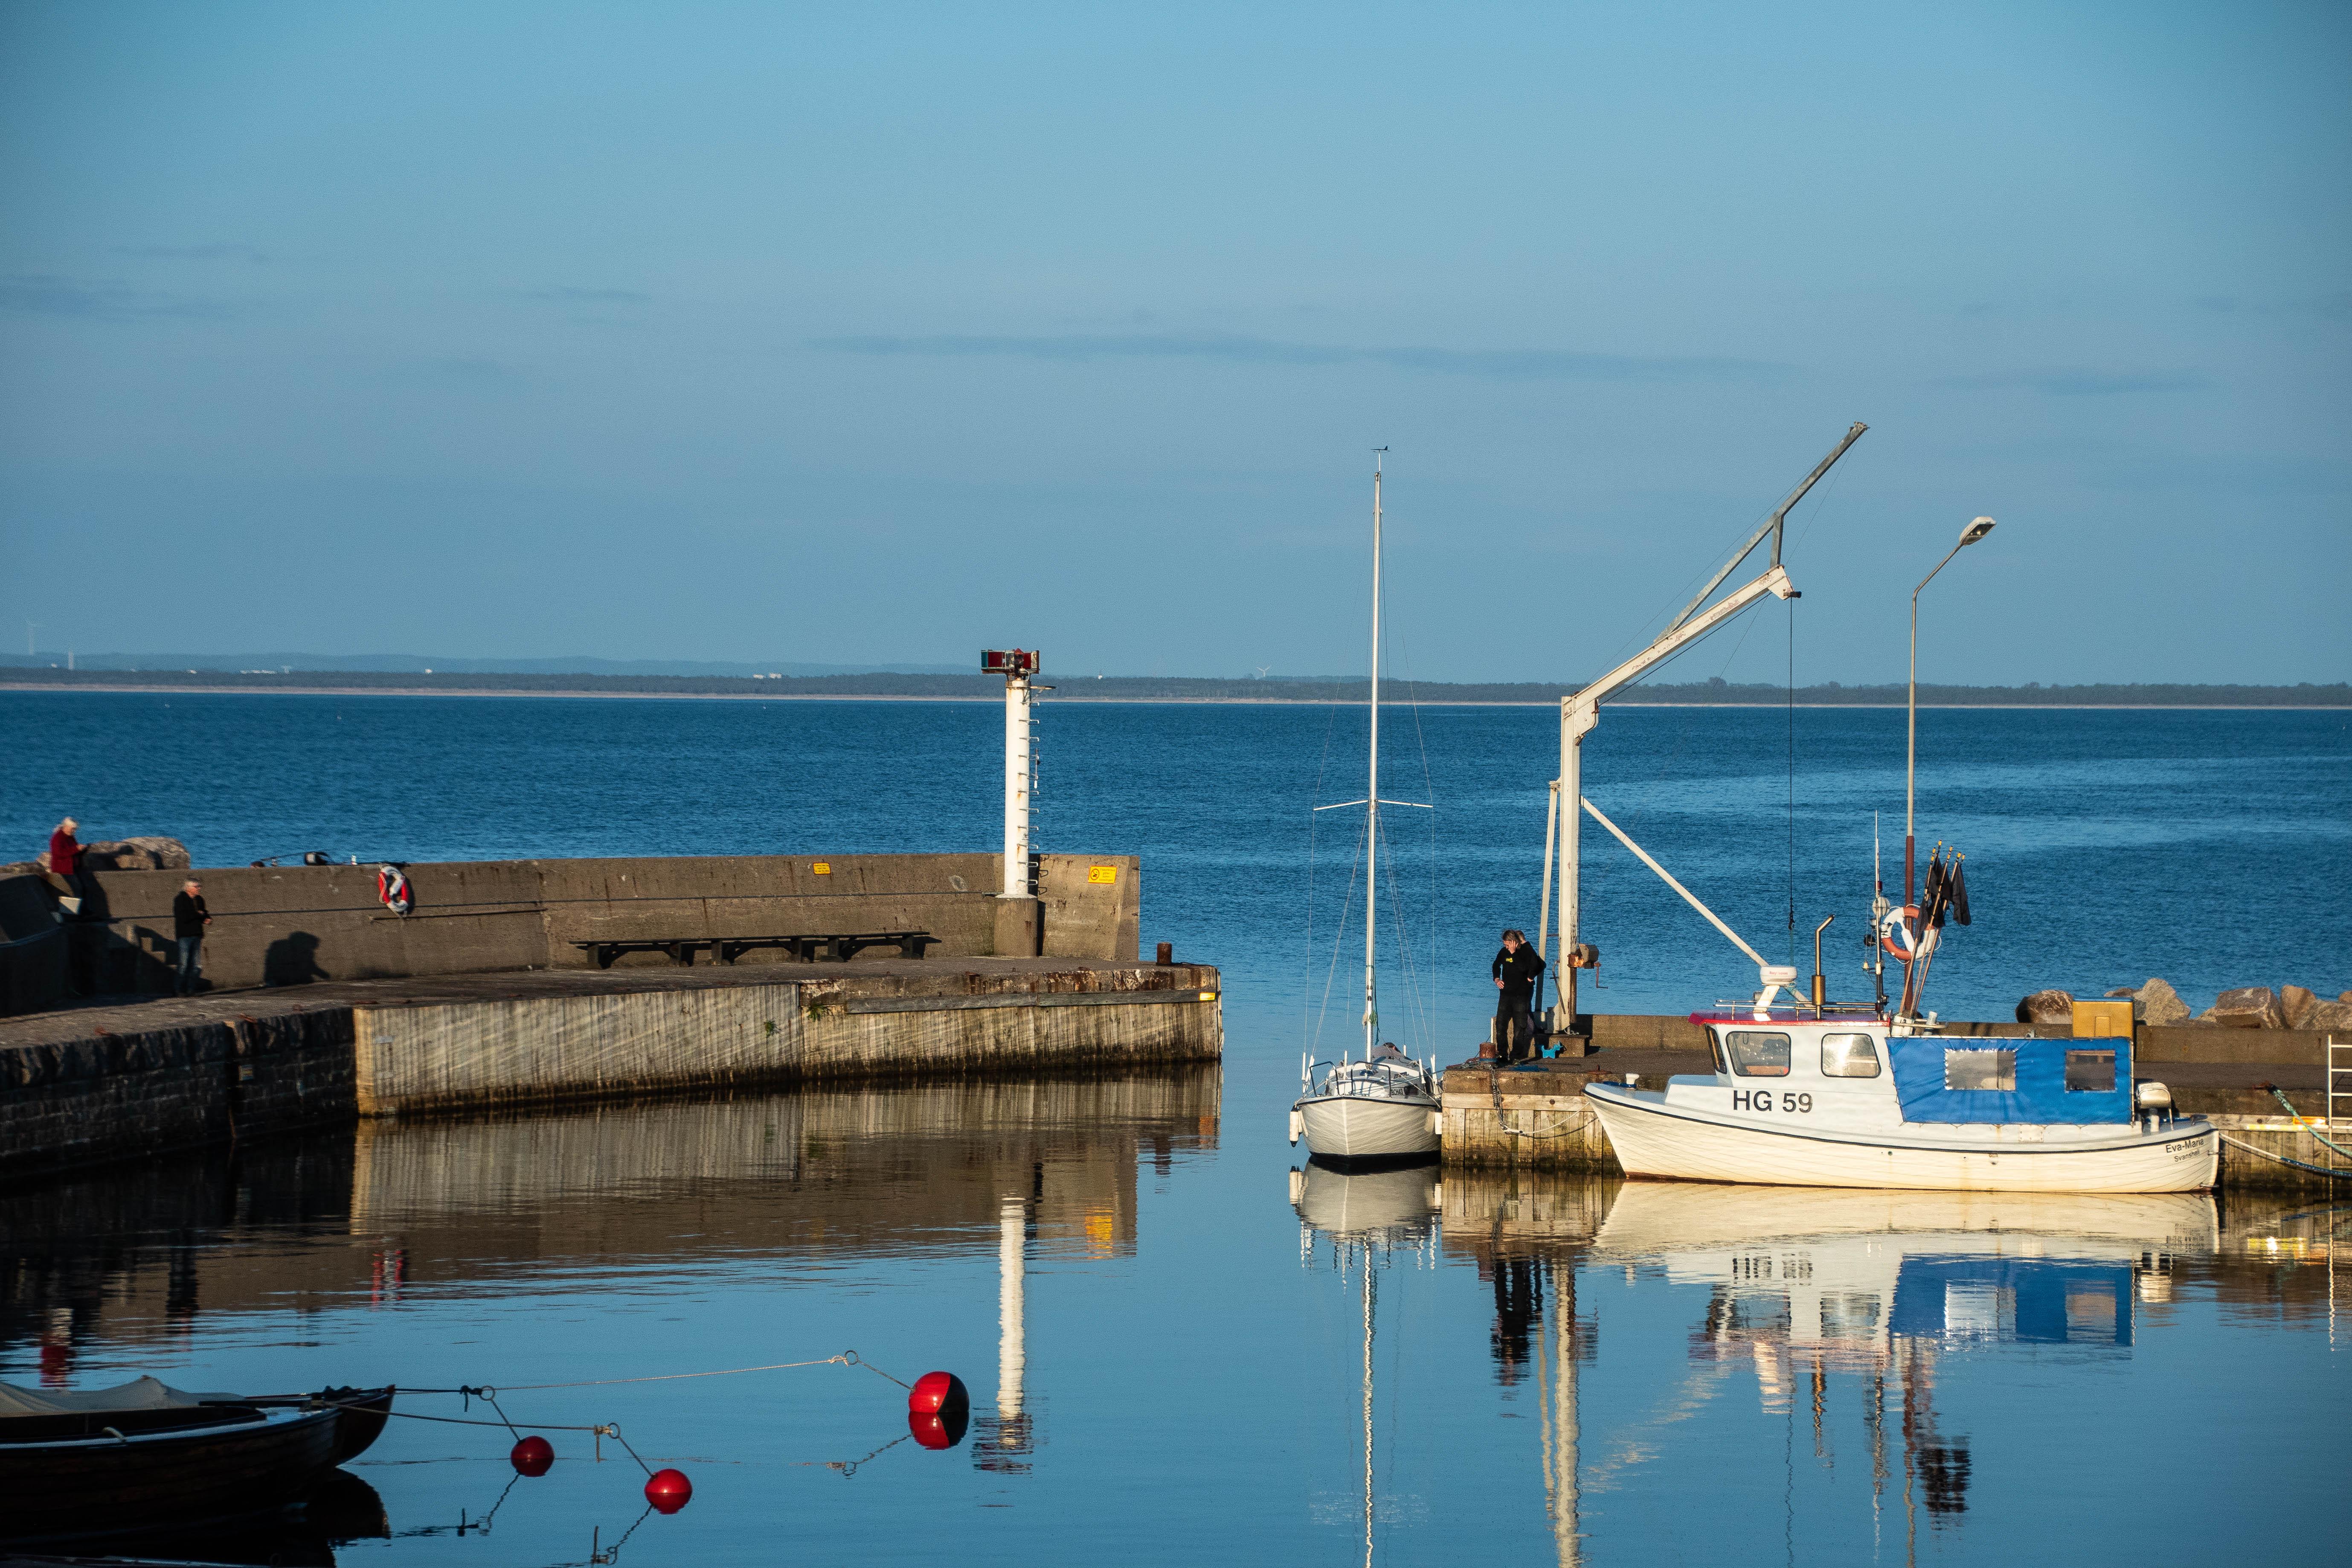 Svanshall harbour